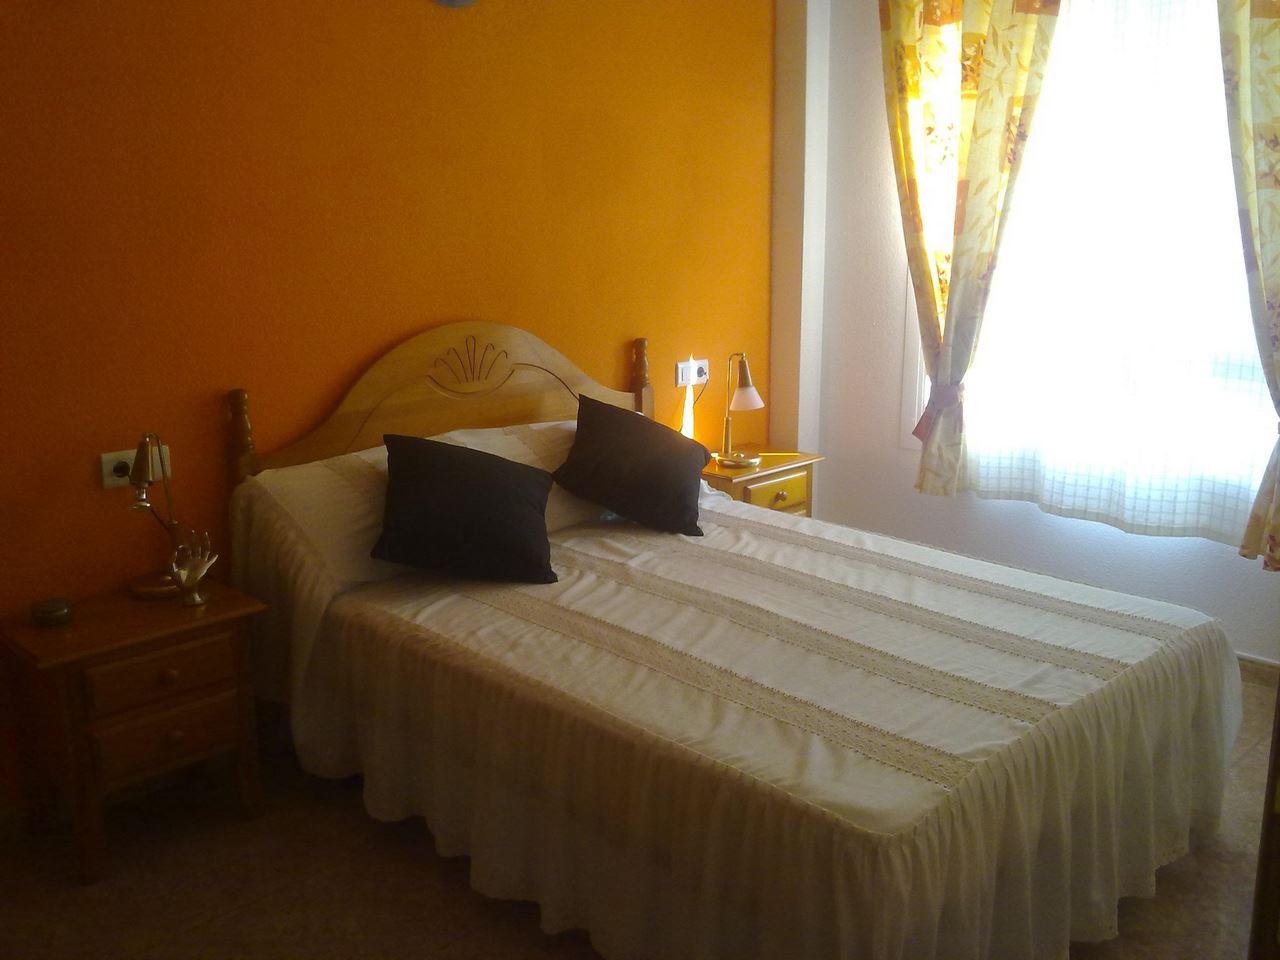 Alquiler de apartamentos Tarragona, Tarragona